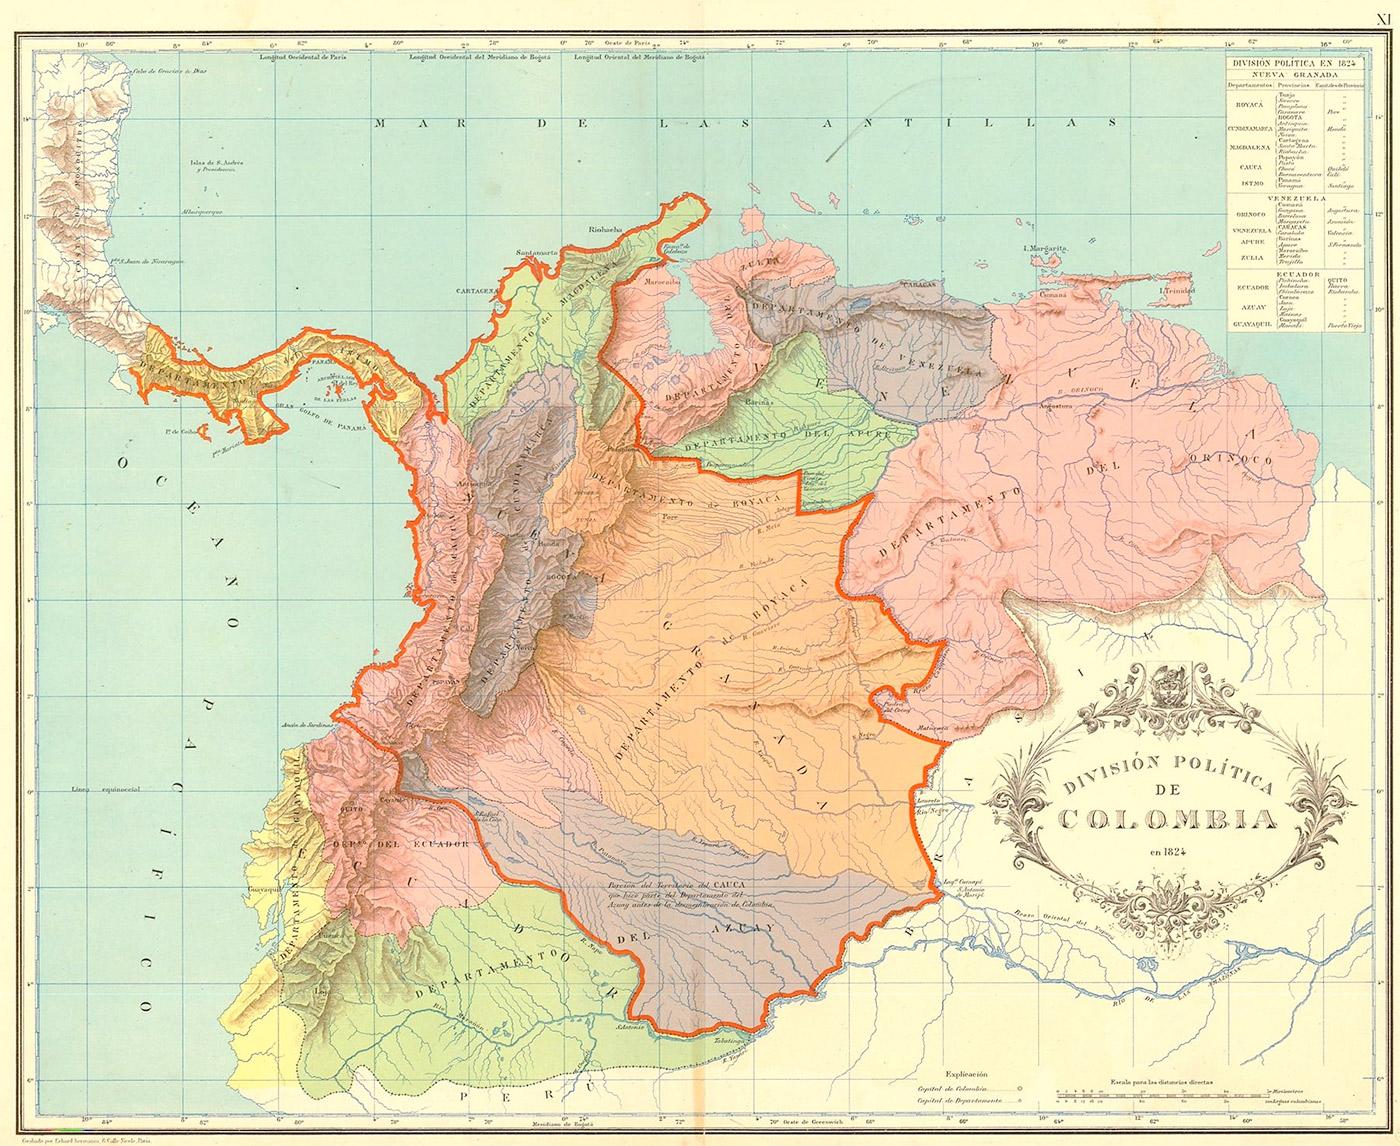 Simon Bolivar and the Spanish Revolutions | History Today